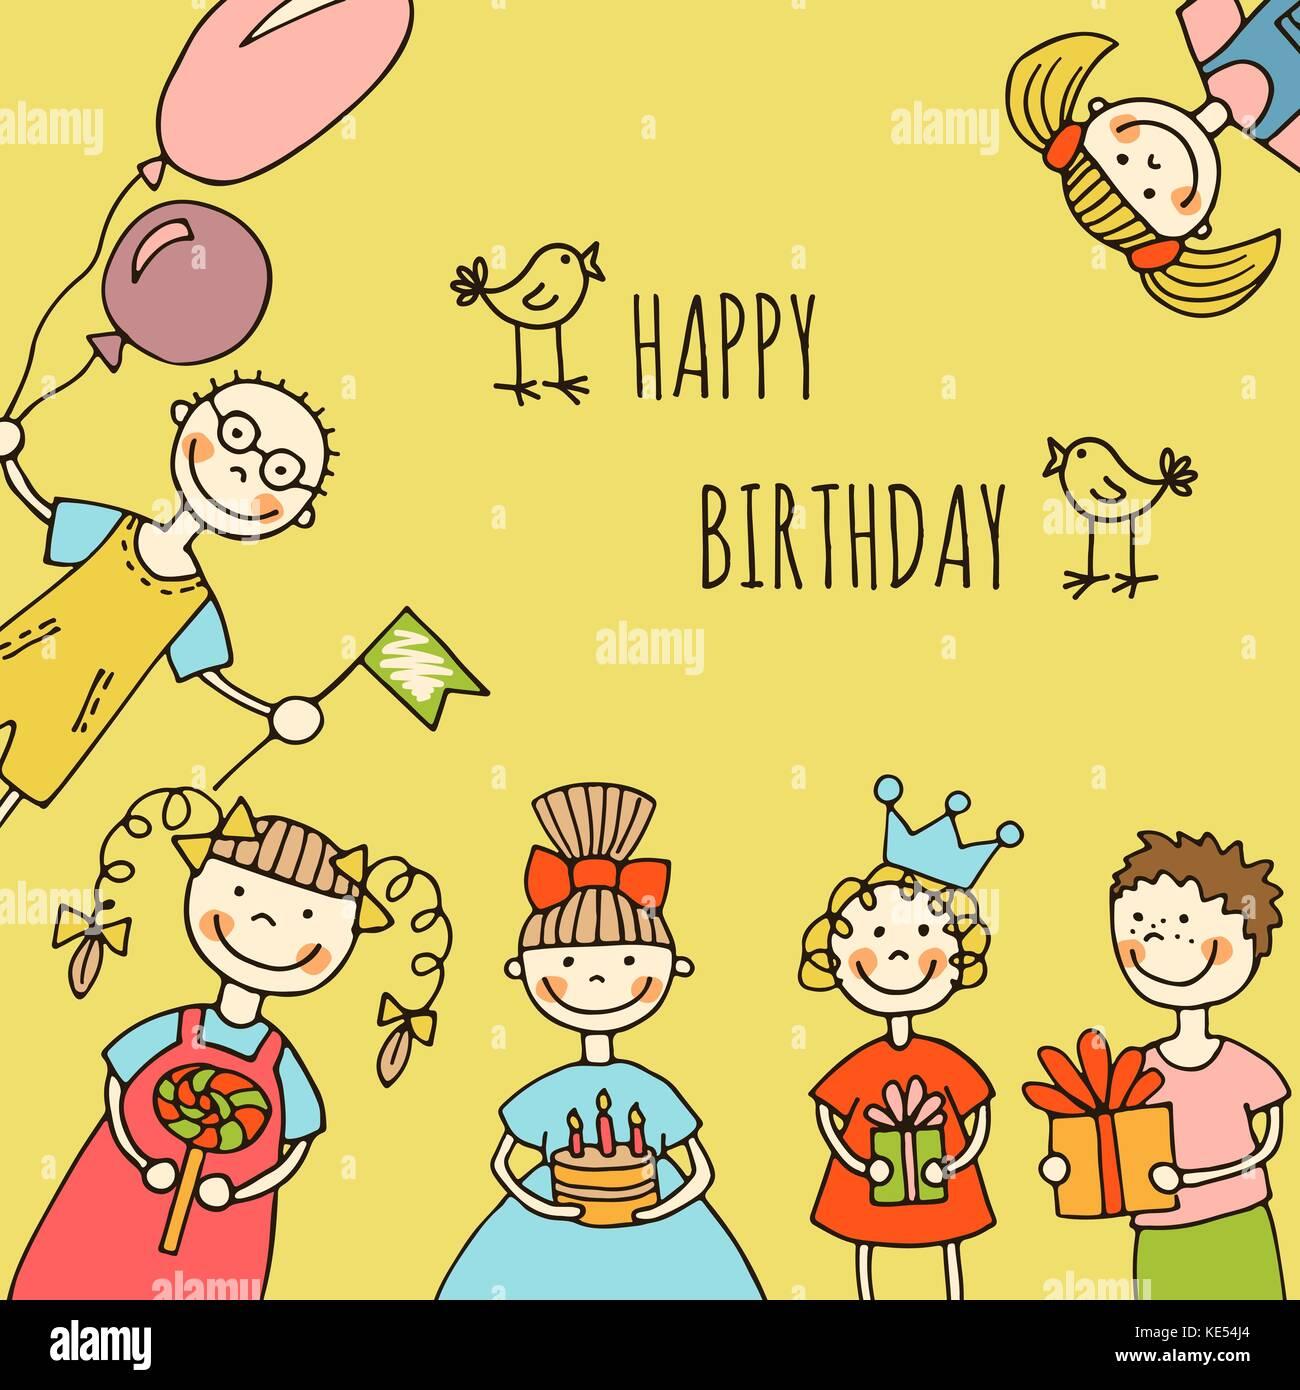 Kids birthday card stock photos kids birthday card stock images happy birthday kids greeting card stock image bookmarktalkfo Images